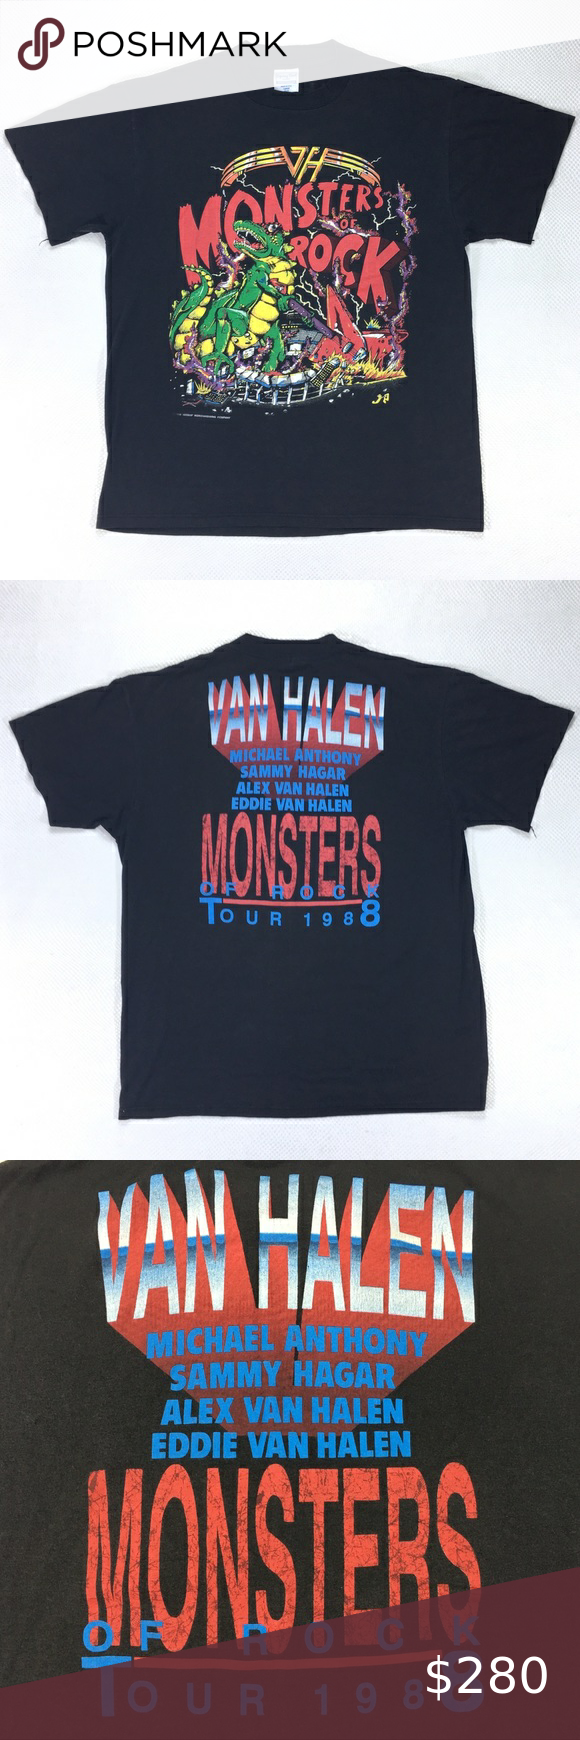 Predownload: Rare 1988 Van Halen Monsters Of Rock Tour T Shirt Tour T Shirts Vintage Rock Tees 80s Band Shirts [ 1740 x 580 Pixel ]